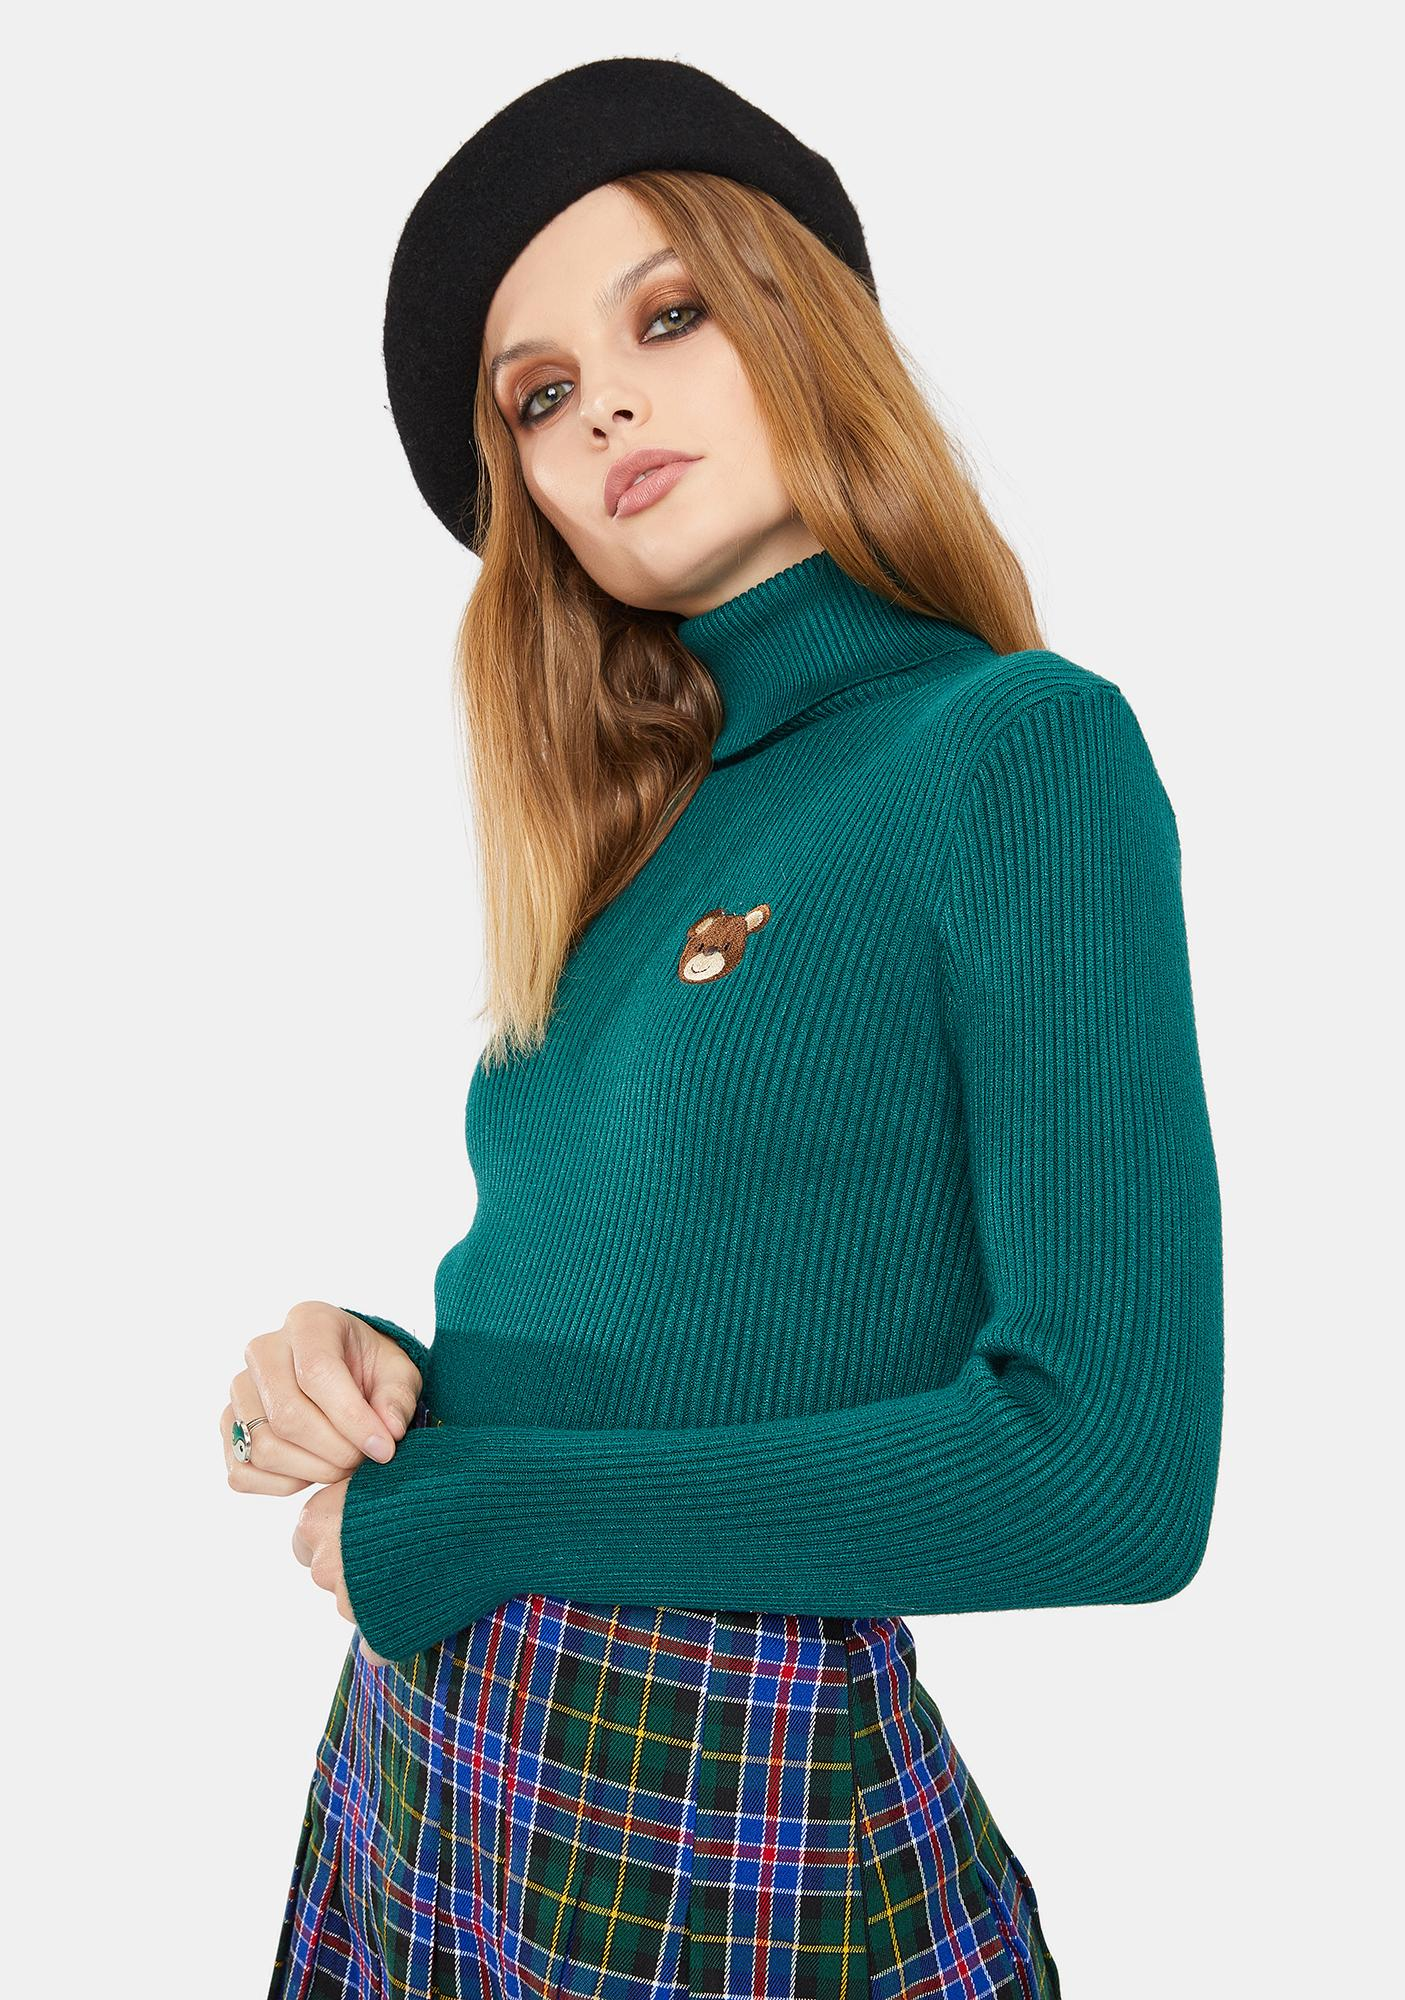 Minga Teddy Bear High Neck Knitted Top